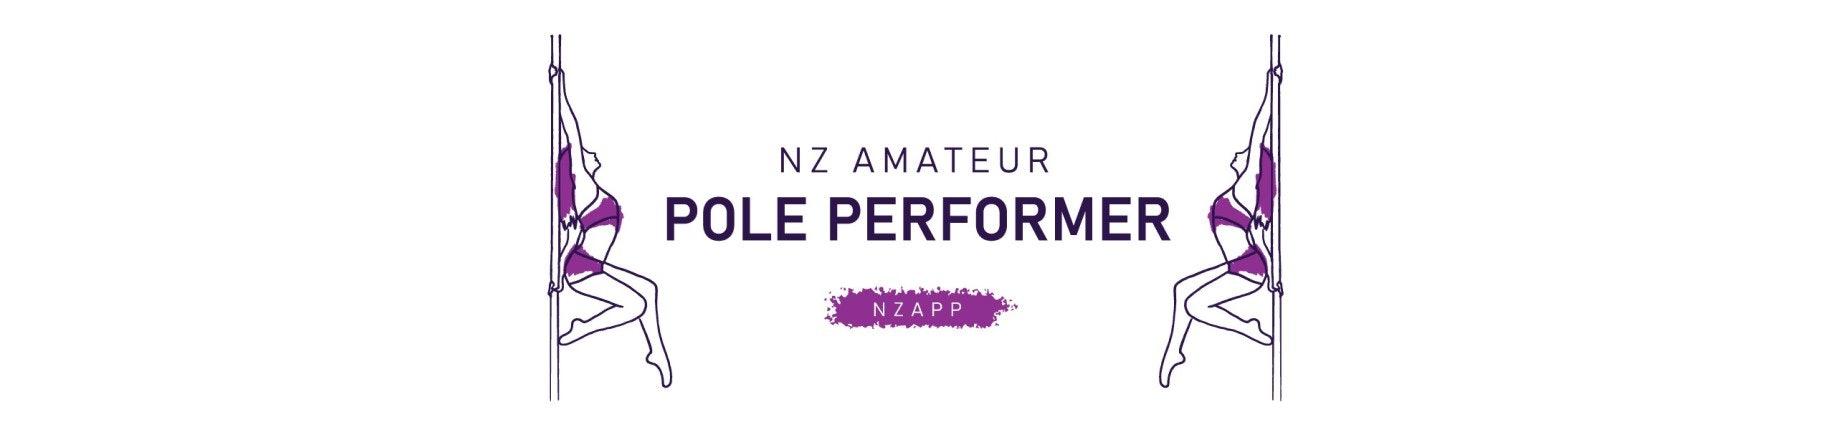 NZ Amateur Pole Performer